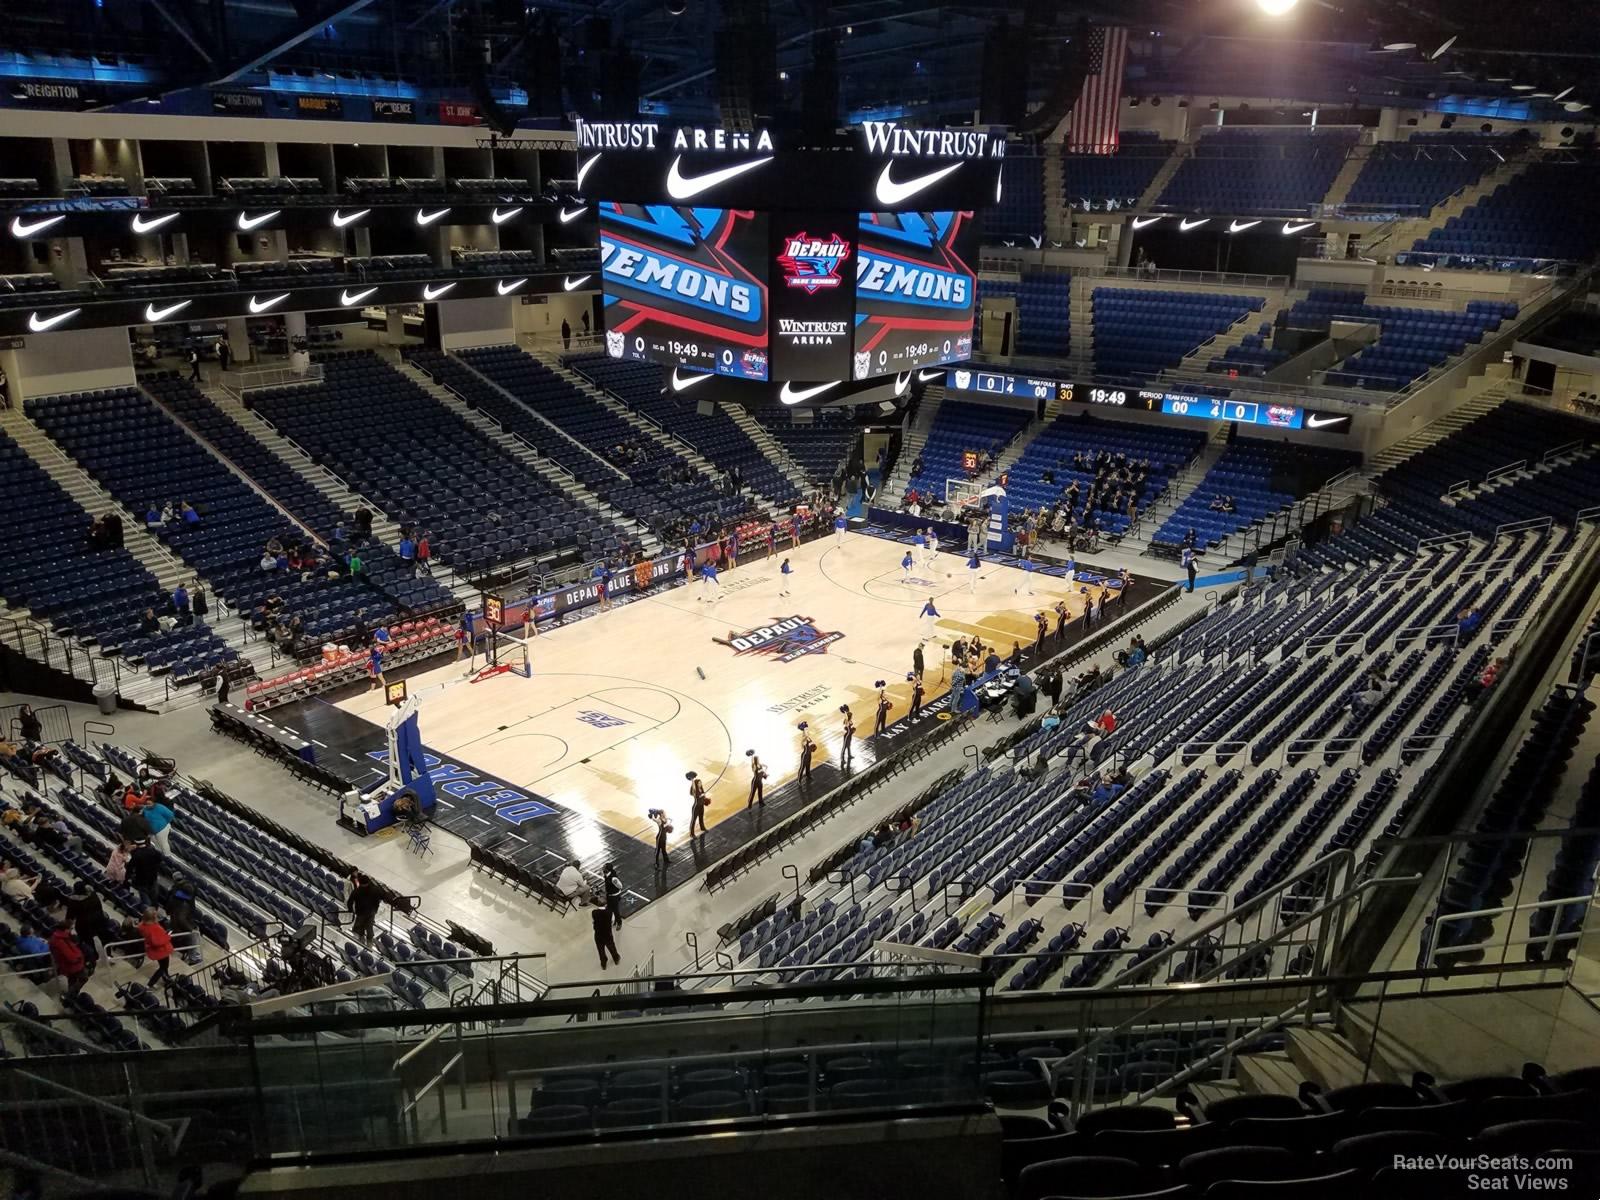 Exterior: Wintrust Arena Section 229